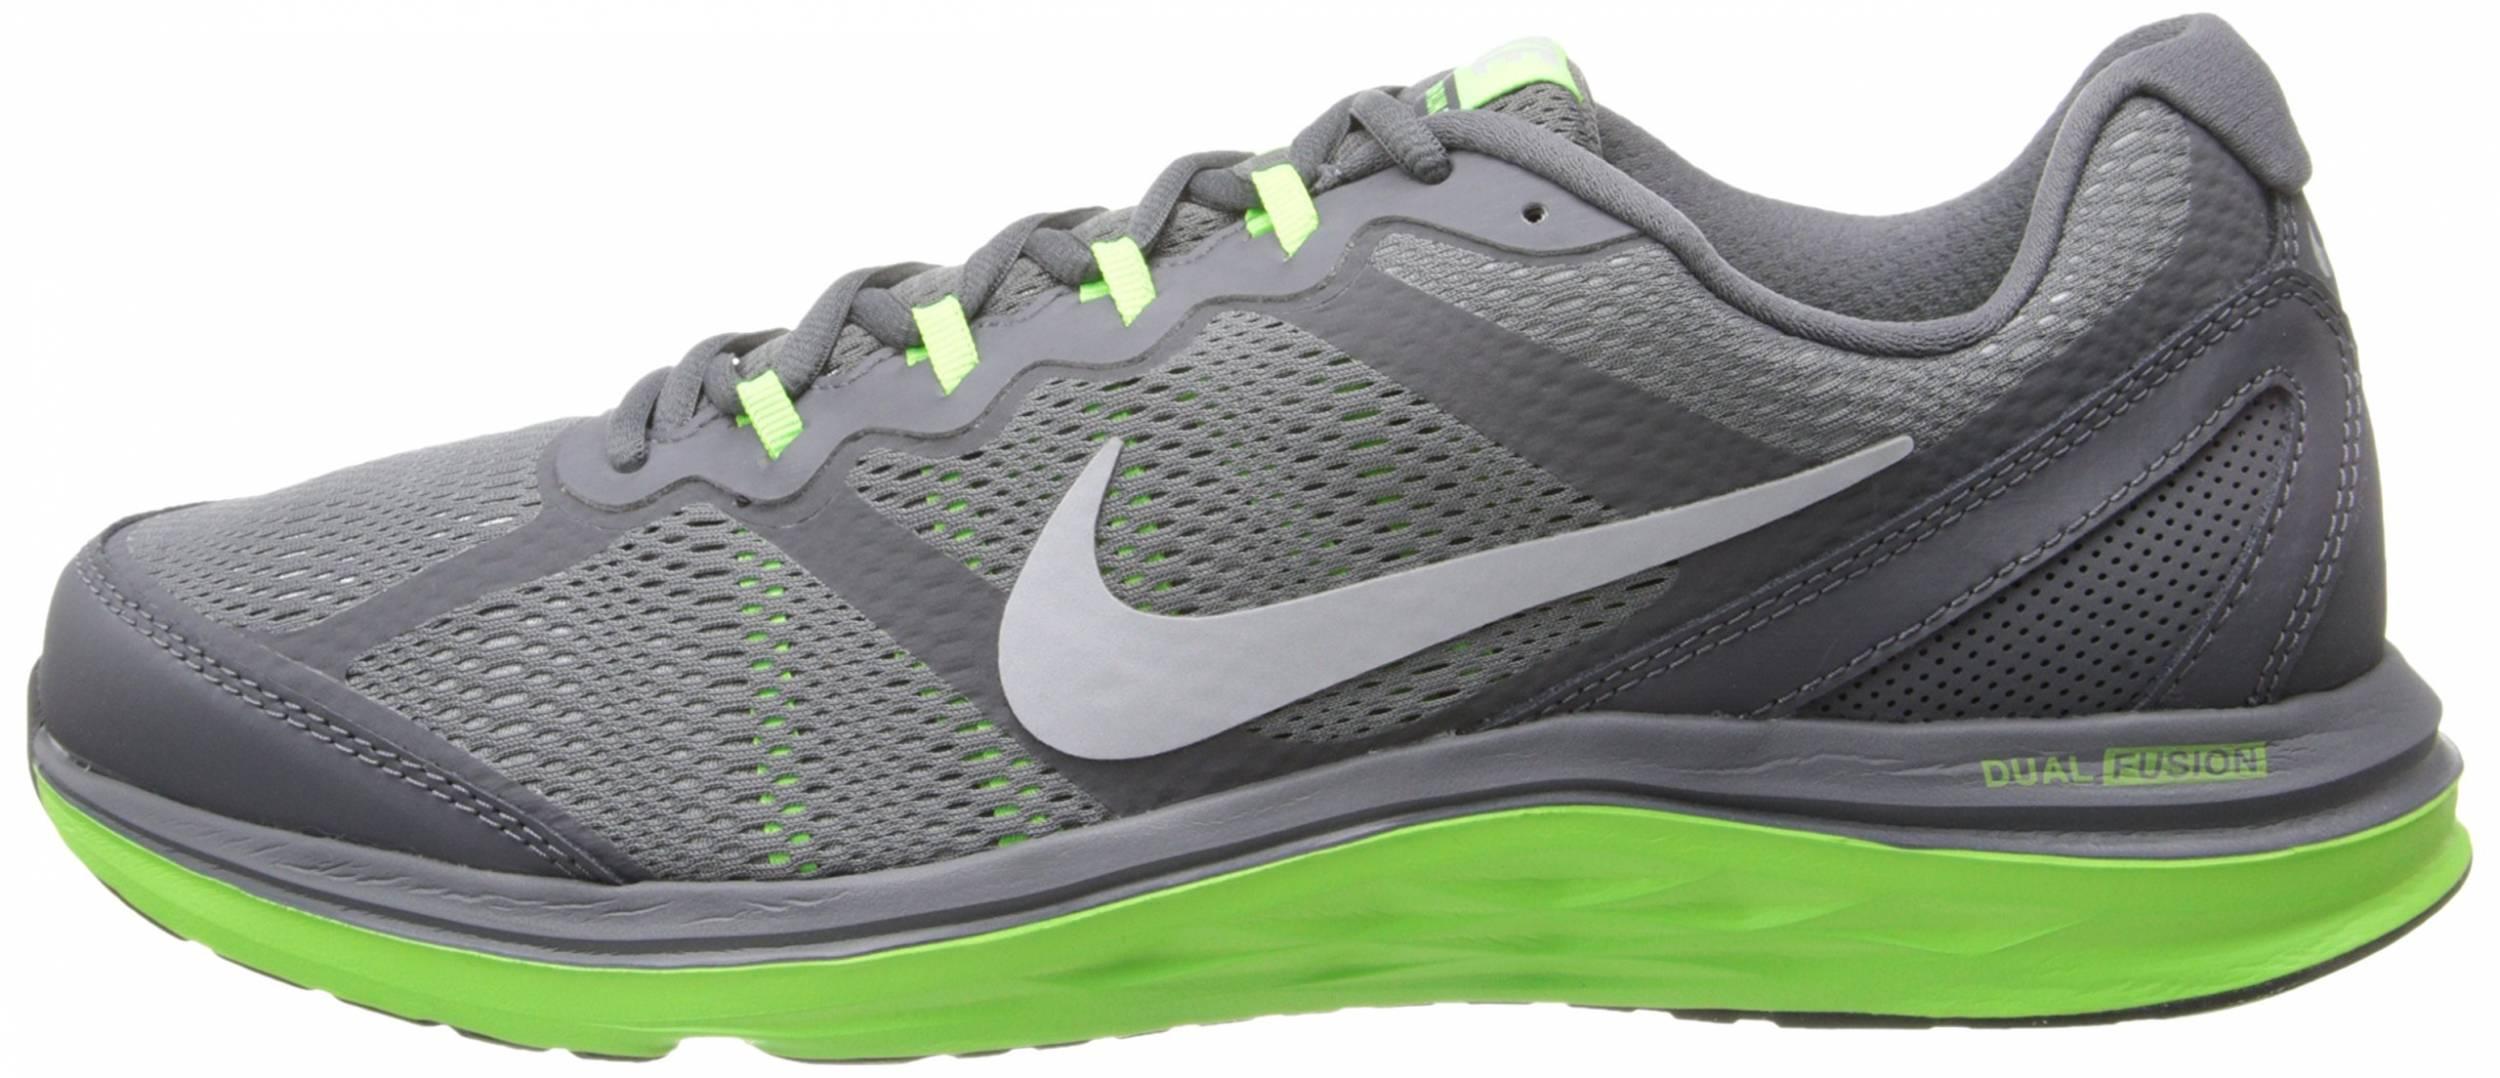 Barriga sol Propiedad  Nike Dual Fusion Run 3 - Deals, Facts, Reviews (2021) | RunRepeat